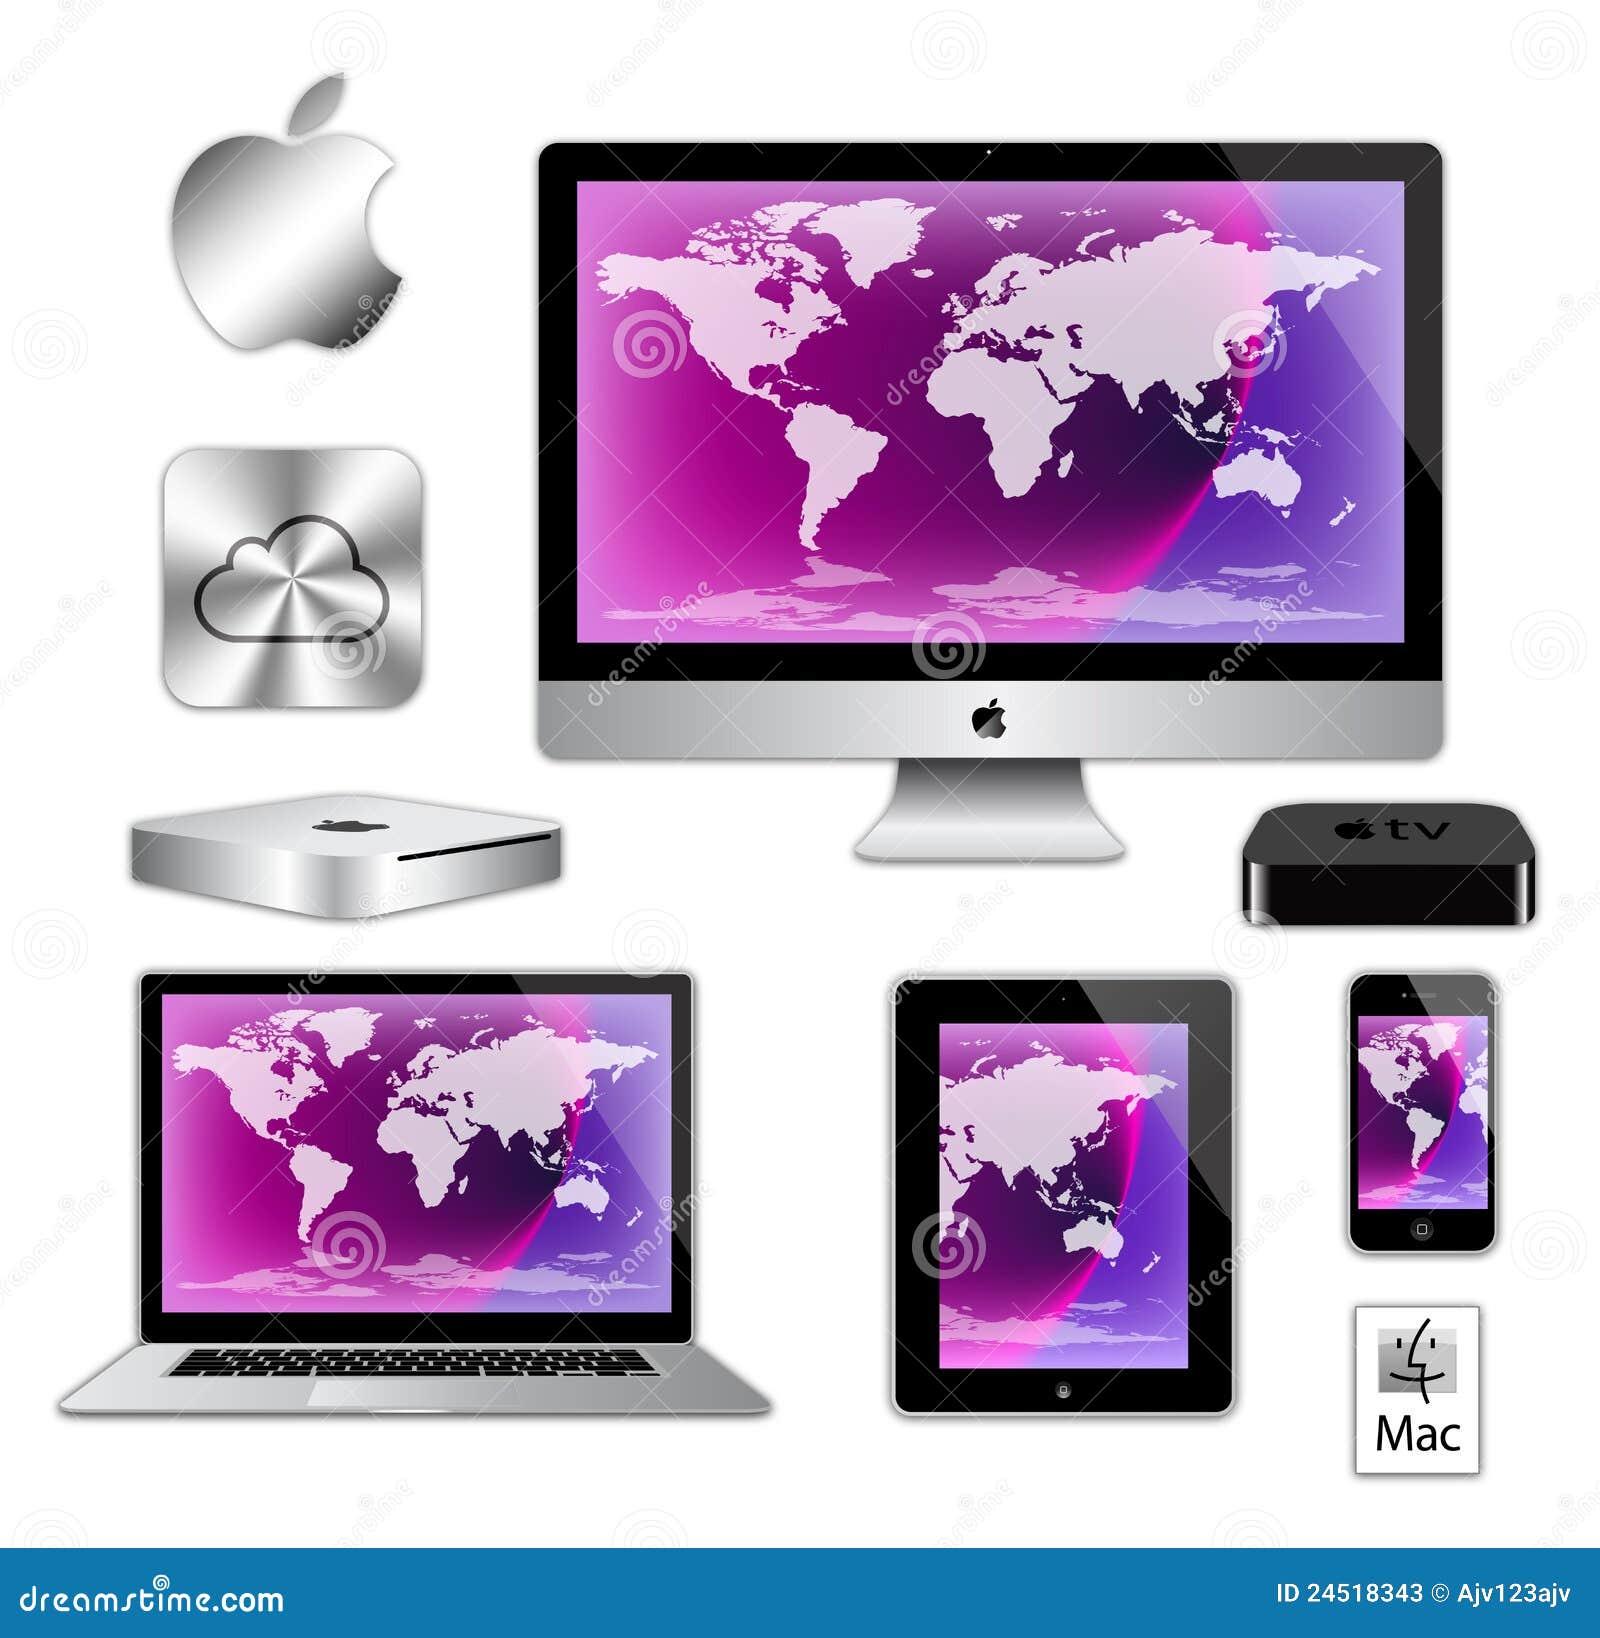 Komputer apple imac ipad iphone macbook